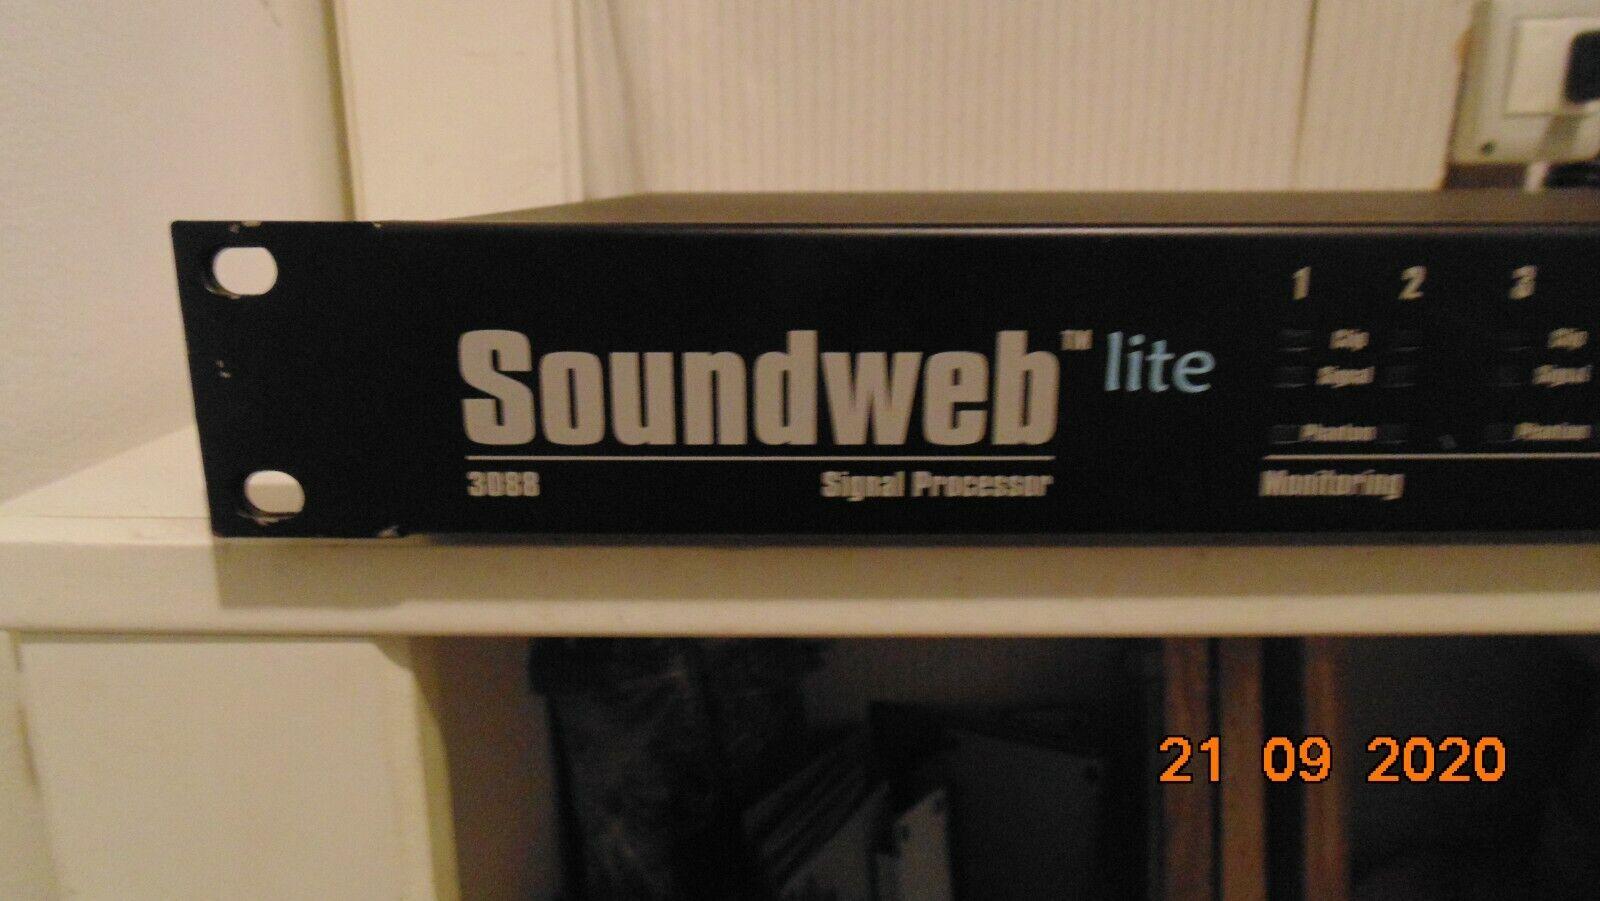 Soundweb Digital Audio Processor